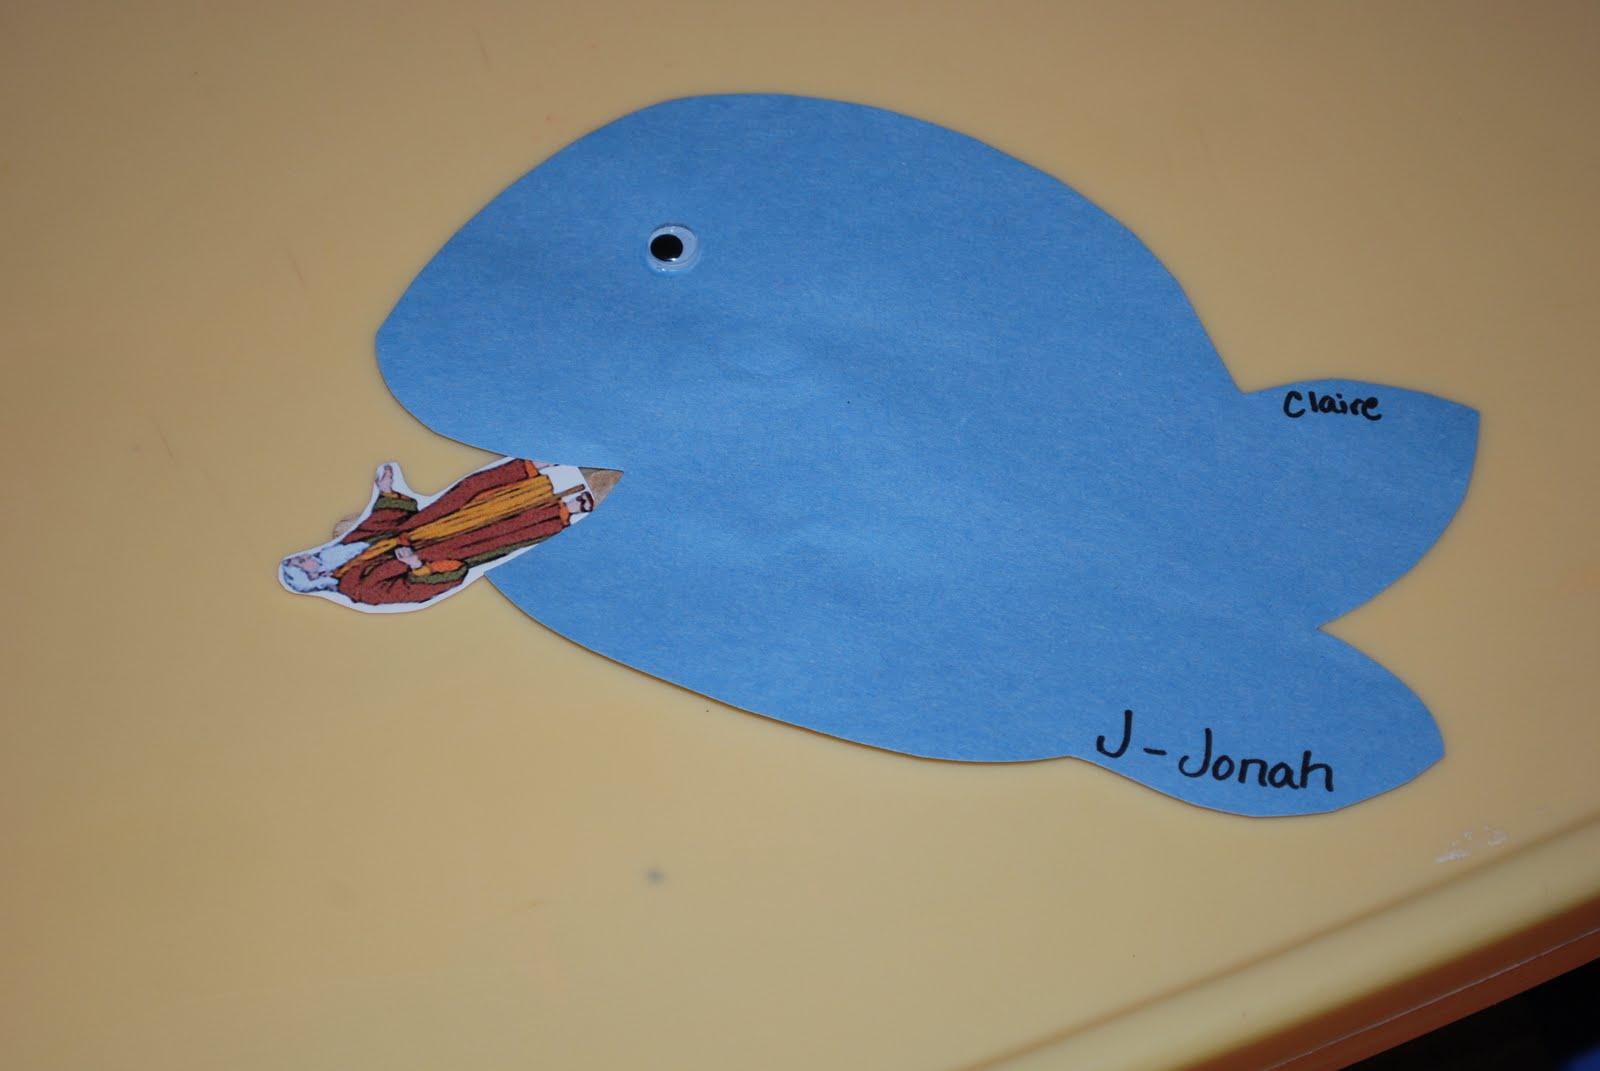 Jonah sunday school craft - Blessings For Bible School Teachers